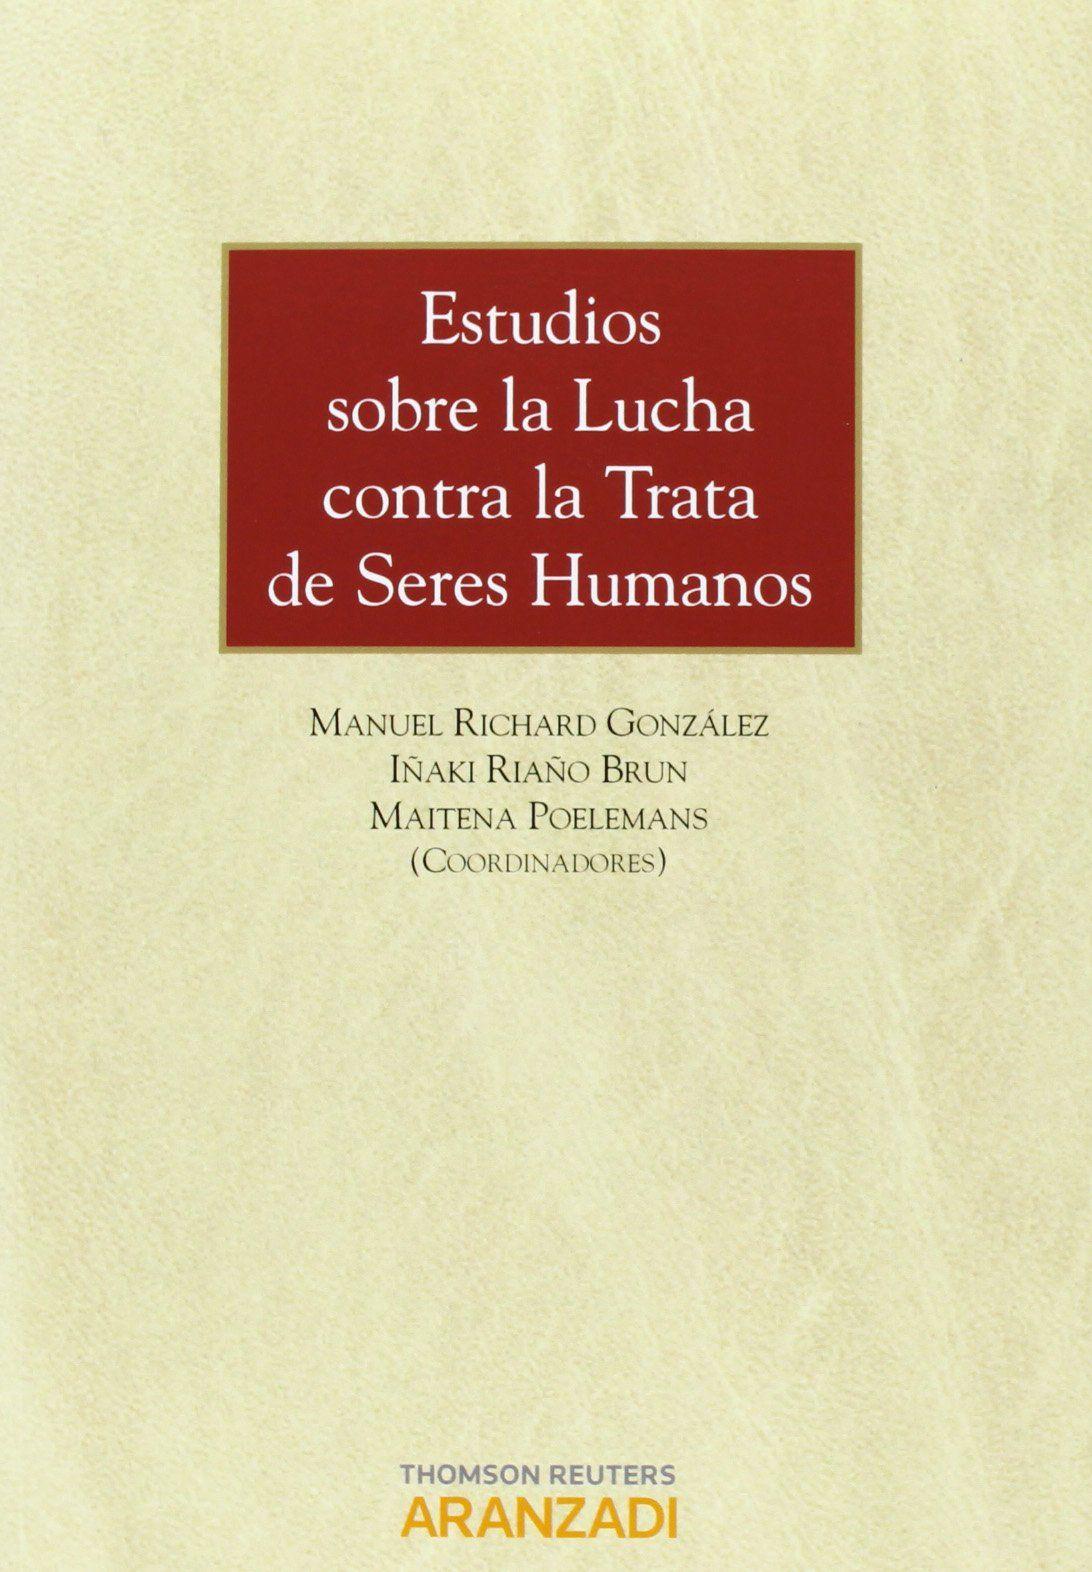 Estudios sobre la lucha contra la trata de seres humanos / coordinadores, Manuel Richard González, Iñaki Riaño Brun, Maitena Poelemans. - 2013